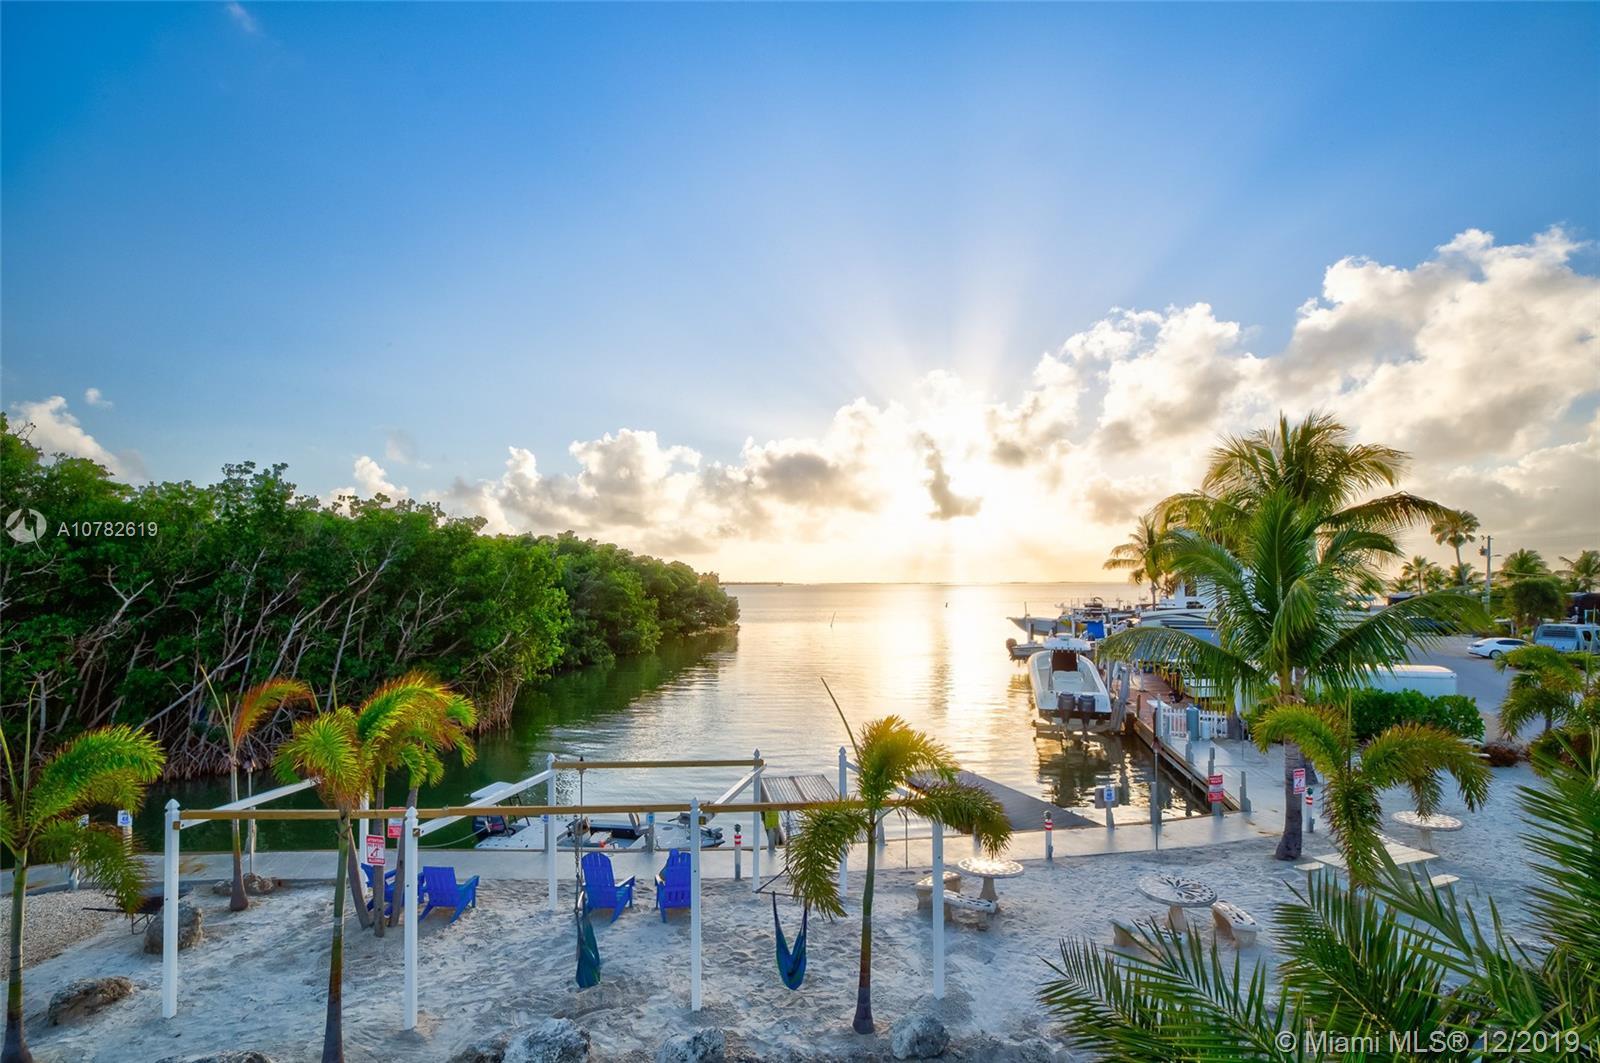 325 Calusa St 6, Key Largo, FL 33037 - Key Largo, FL real estate listing